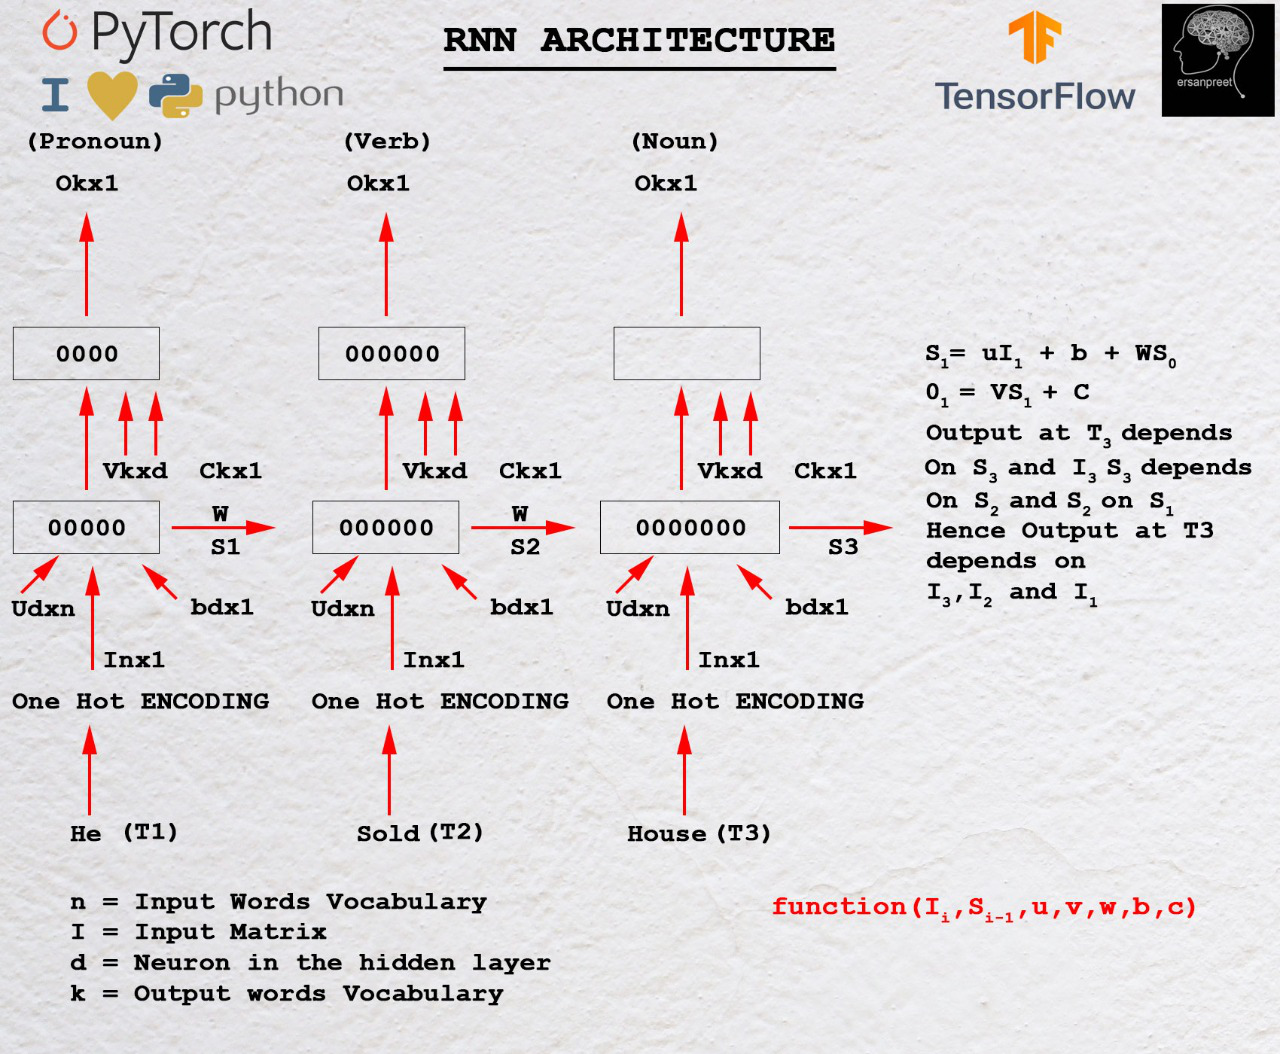 Mathematics behind RNN